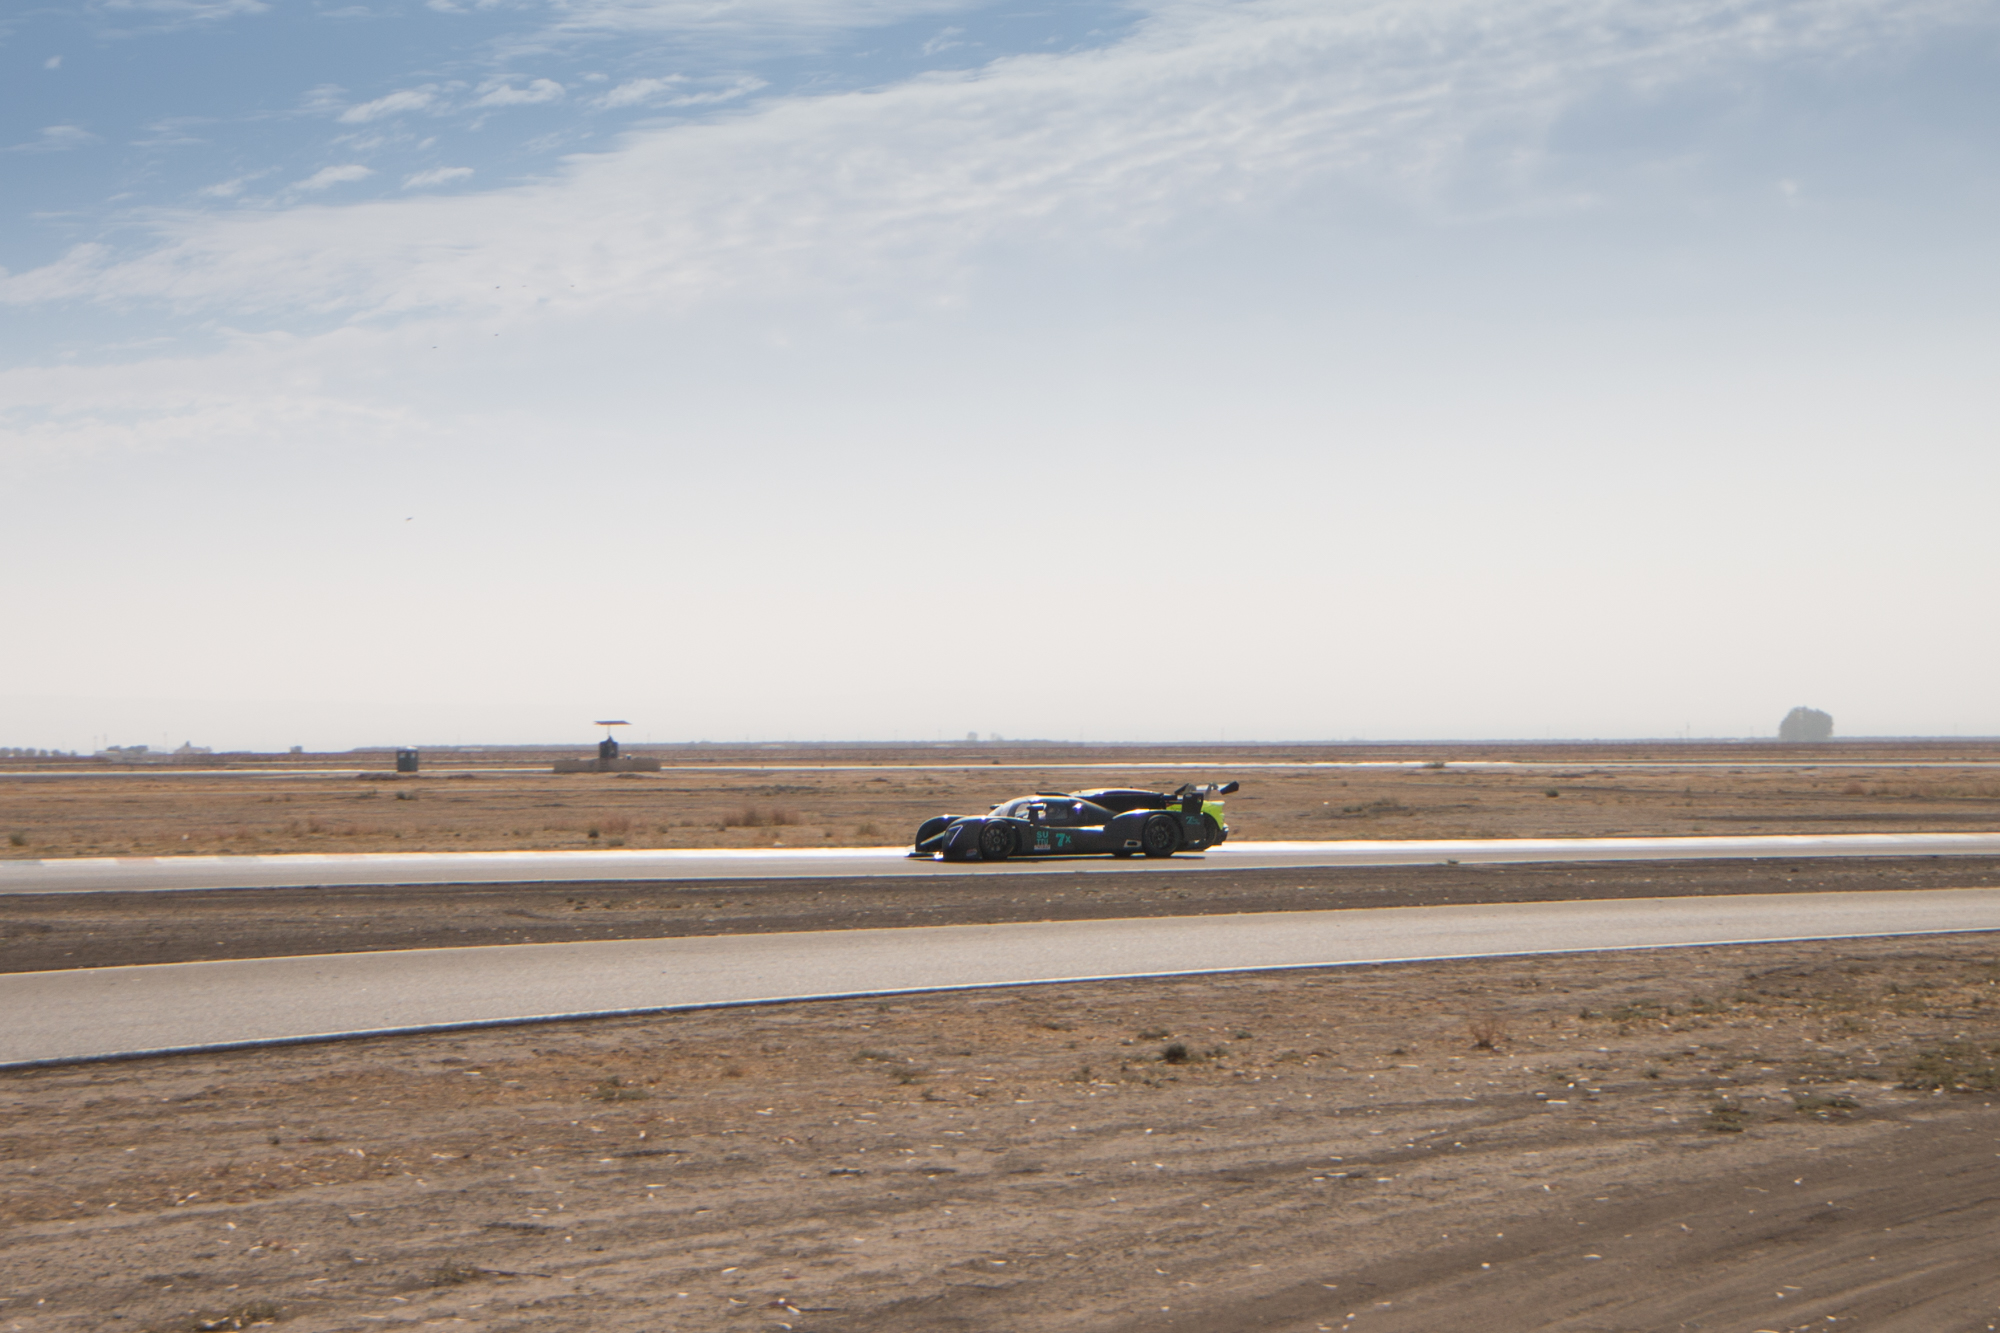 Steven-Racing-20130301-55511.jpg